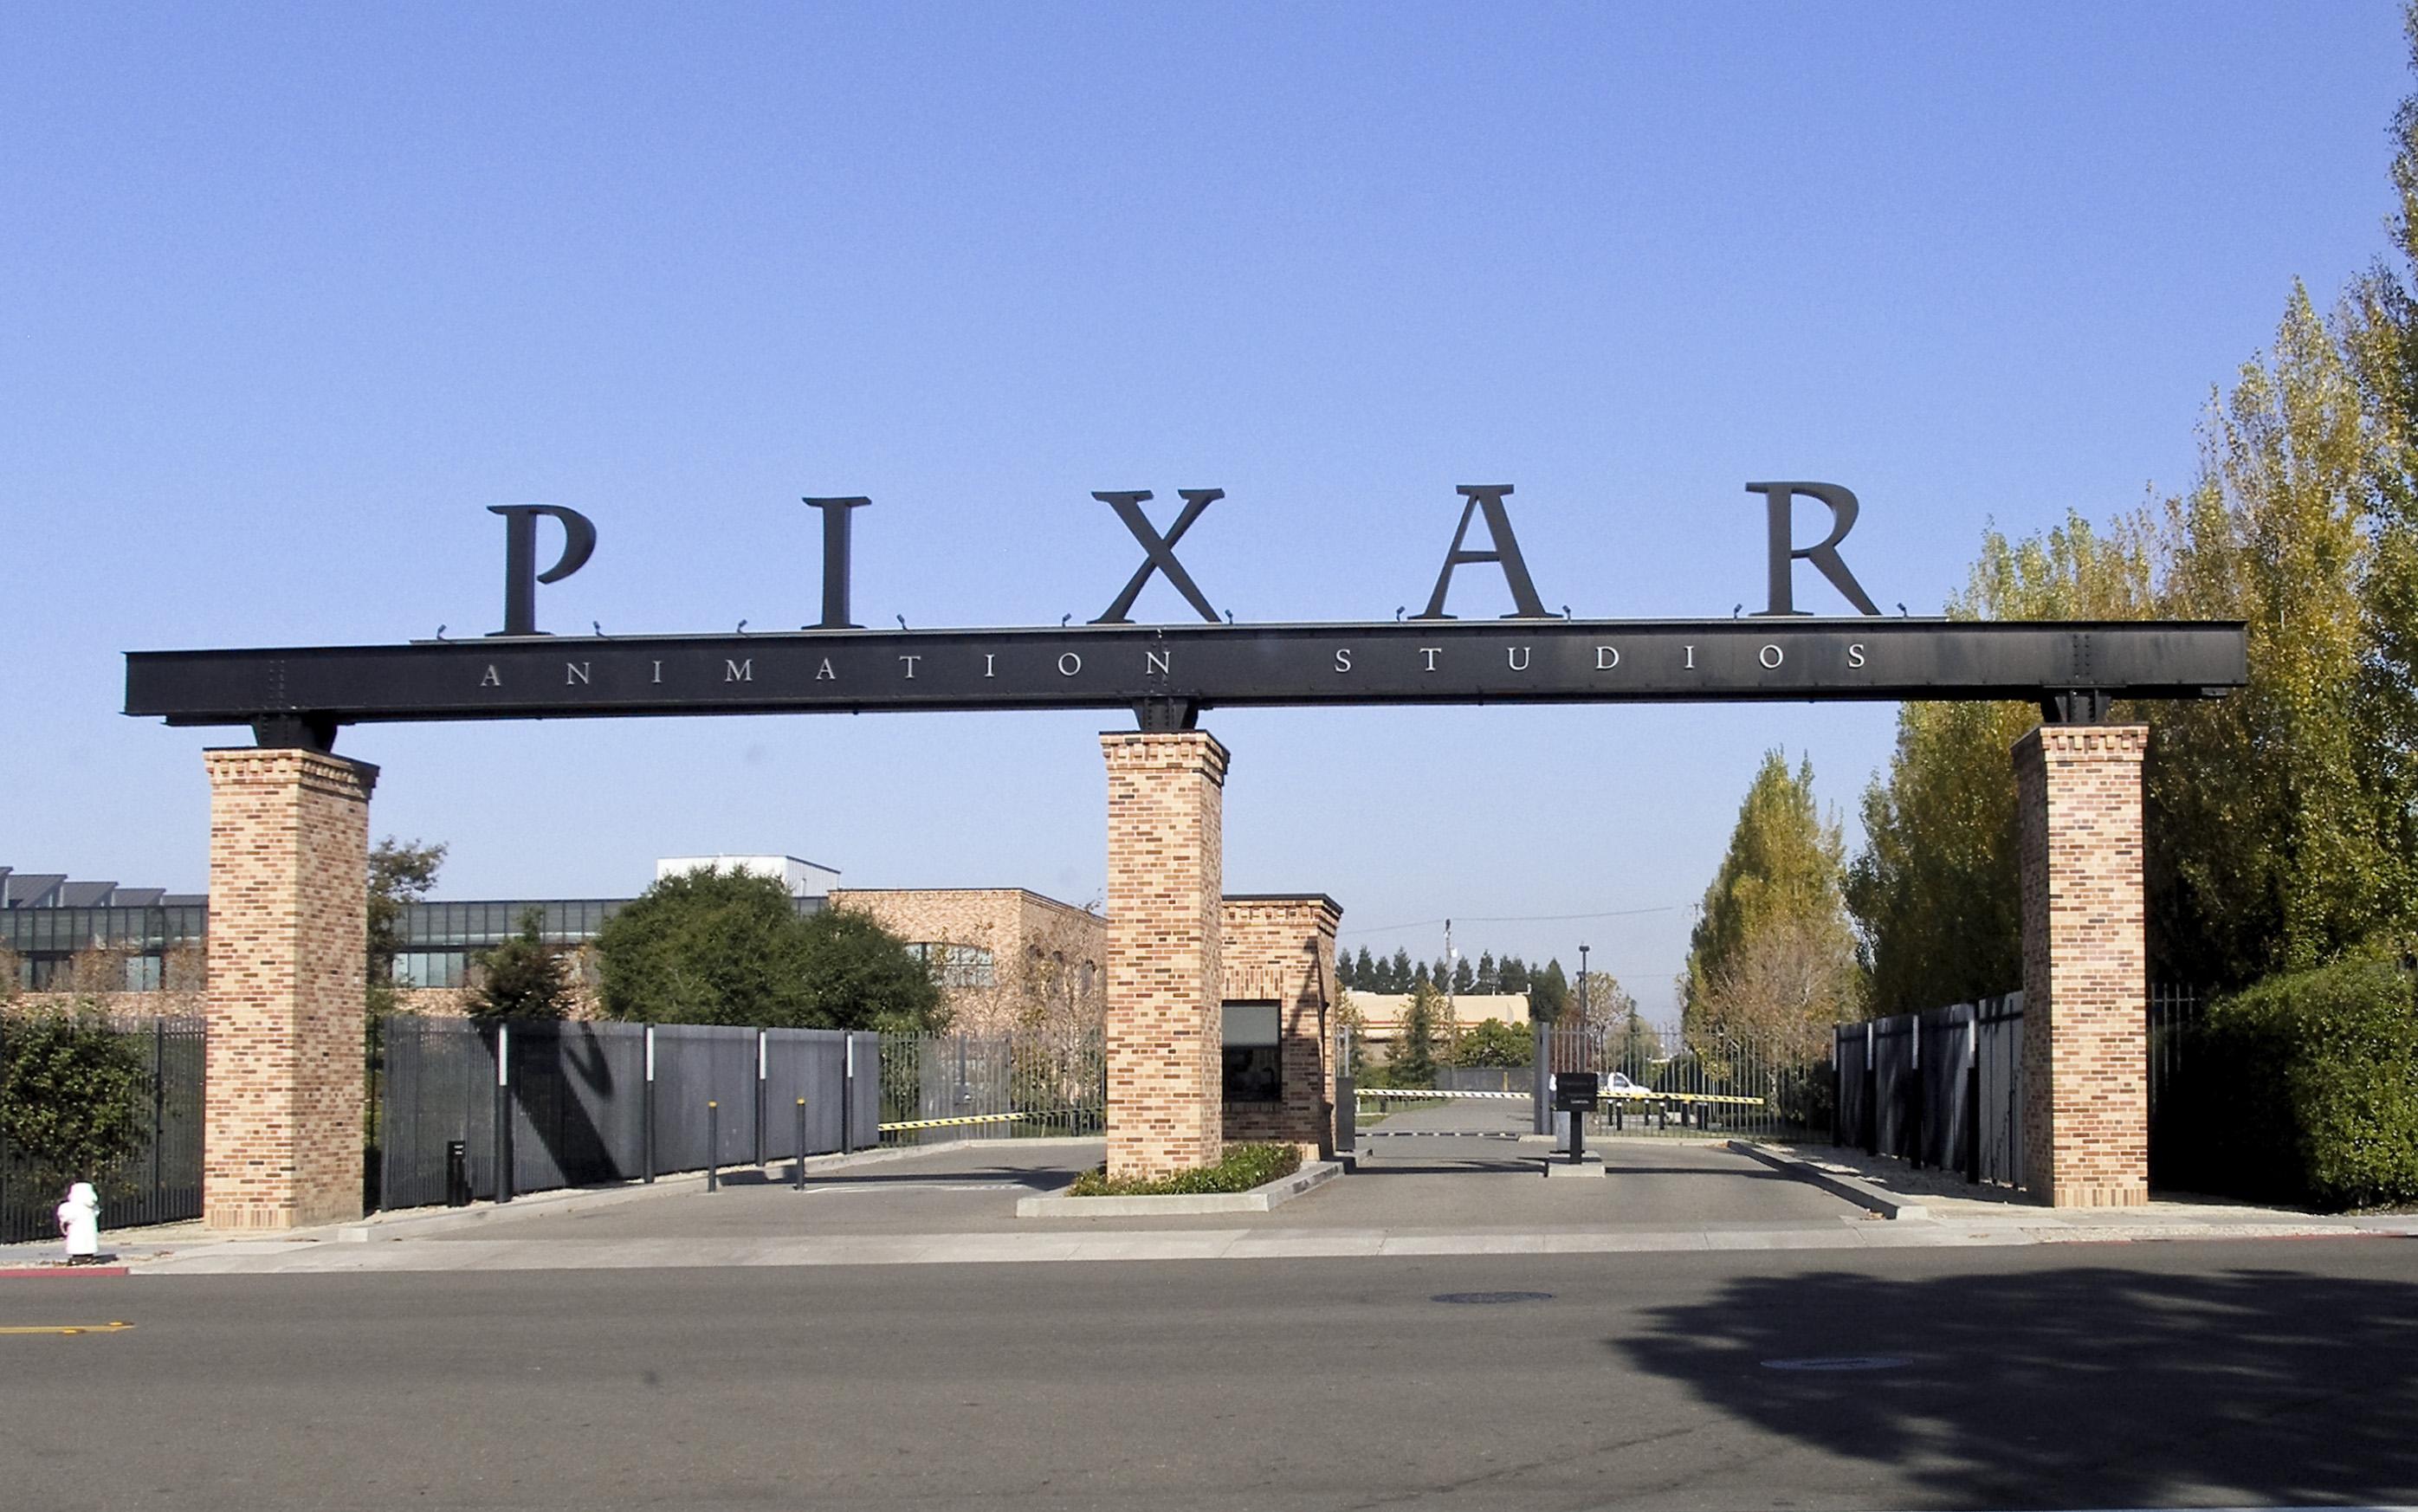 Disney Pixar Animation Studios